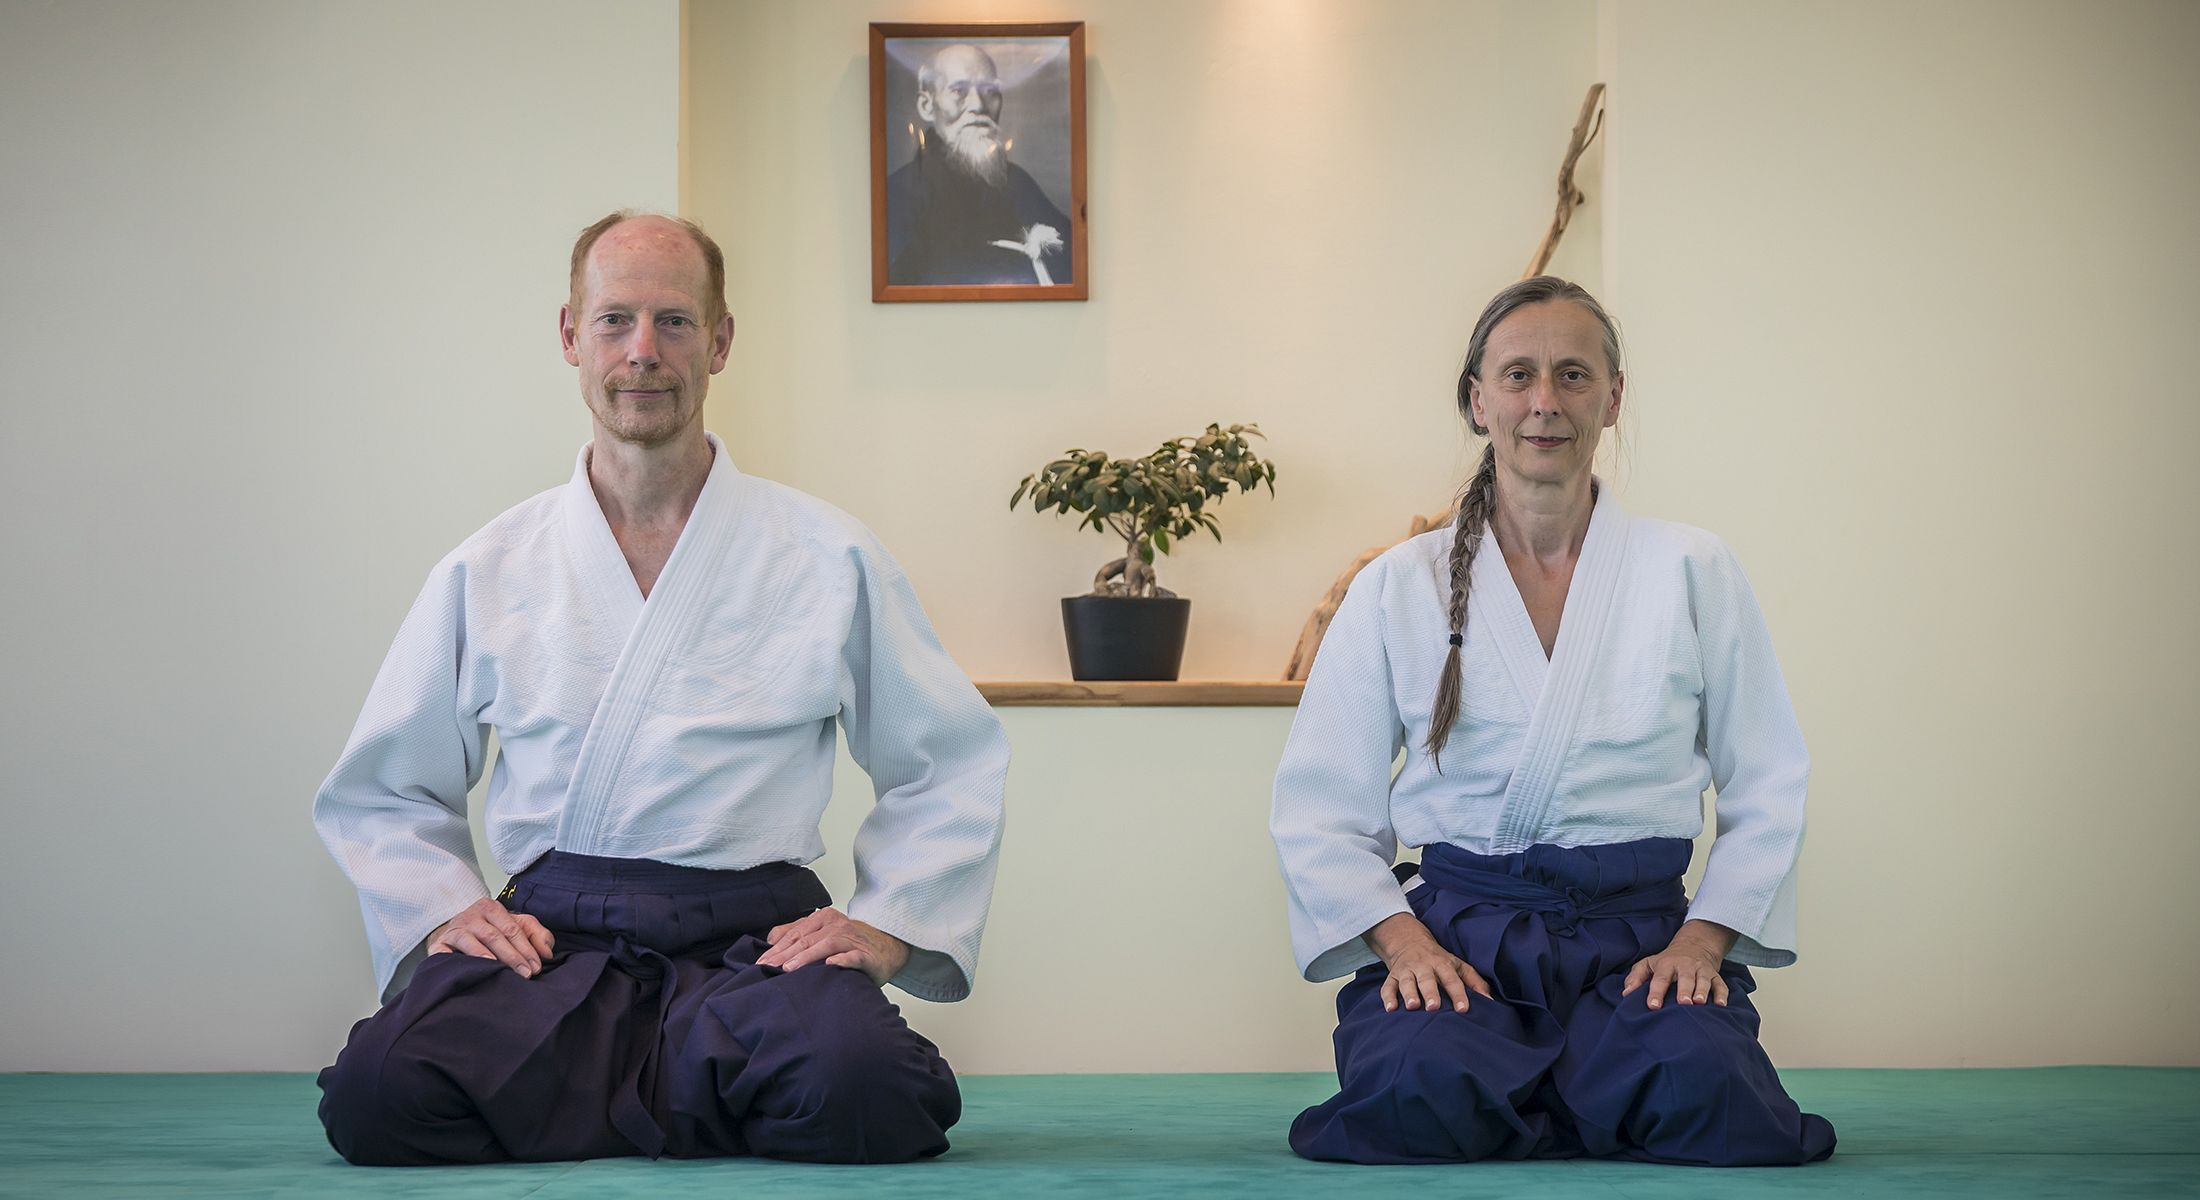 http://www.aikido-schule-bielefeld.de/wp-content/uploads/2018/12/slider11_1.jpg